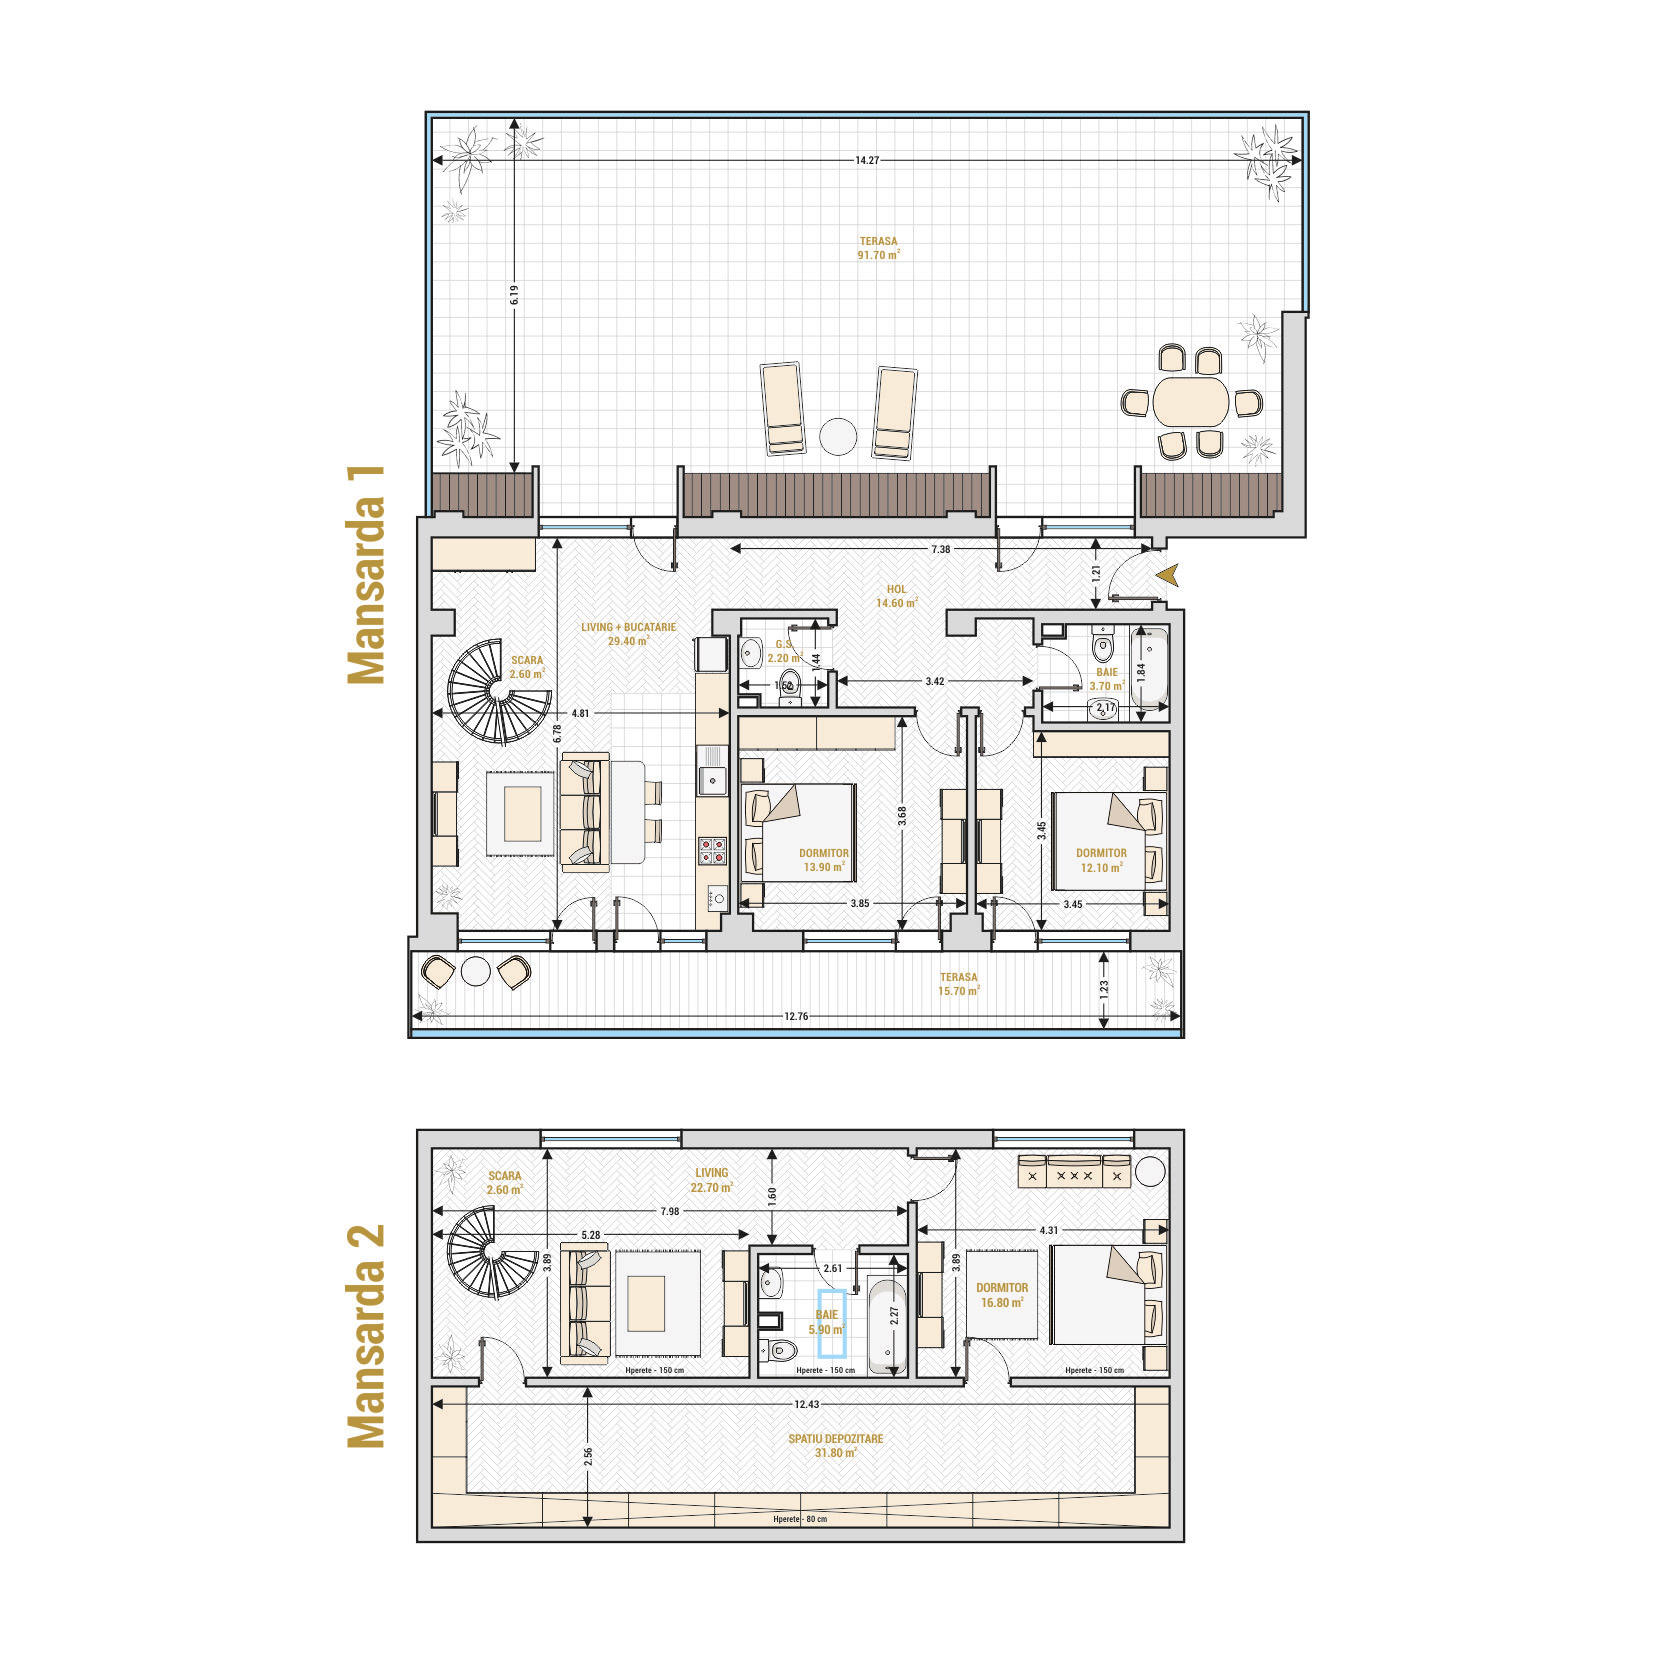 Duplex cu 5 camere Bucuresti - Catedral Residence - Marriott, Piata Unirii, 13 Septembrie, Izvor - Suprafata utila totala - 265.70 mp